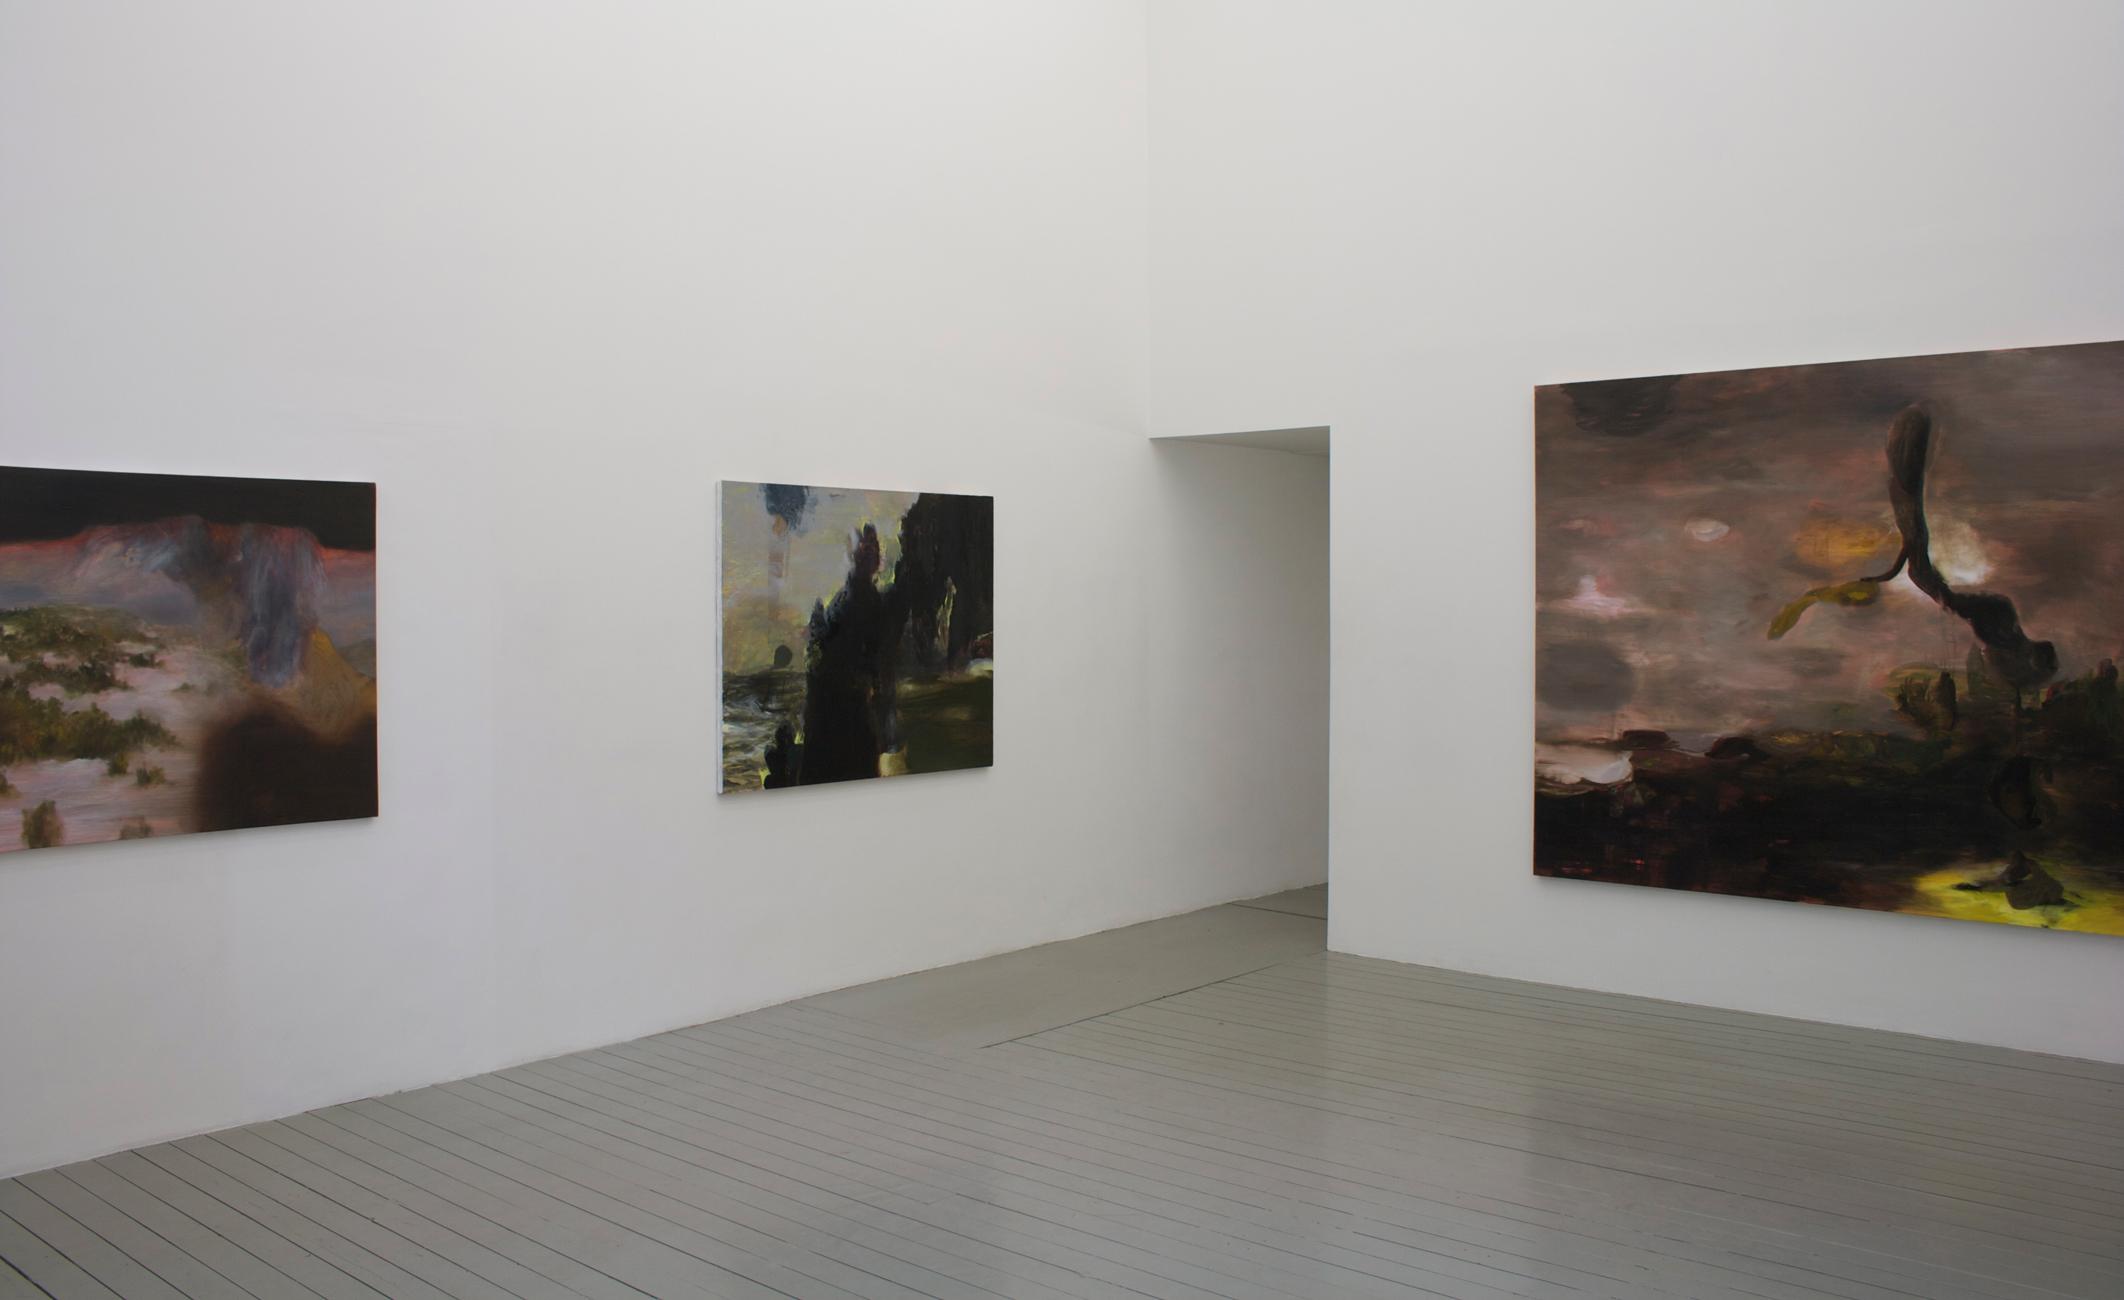 Martin Ålund, Peter Bergman Gallery